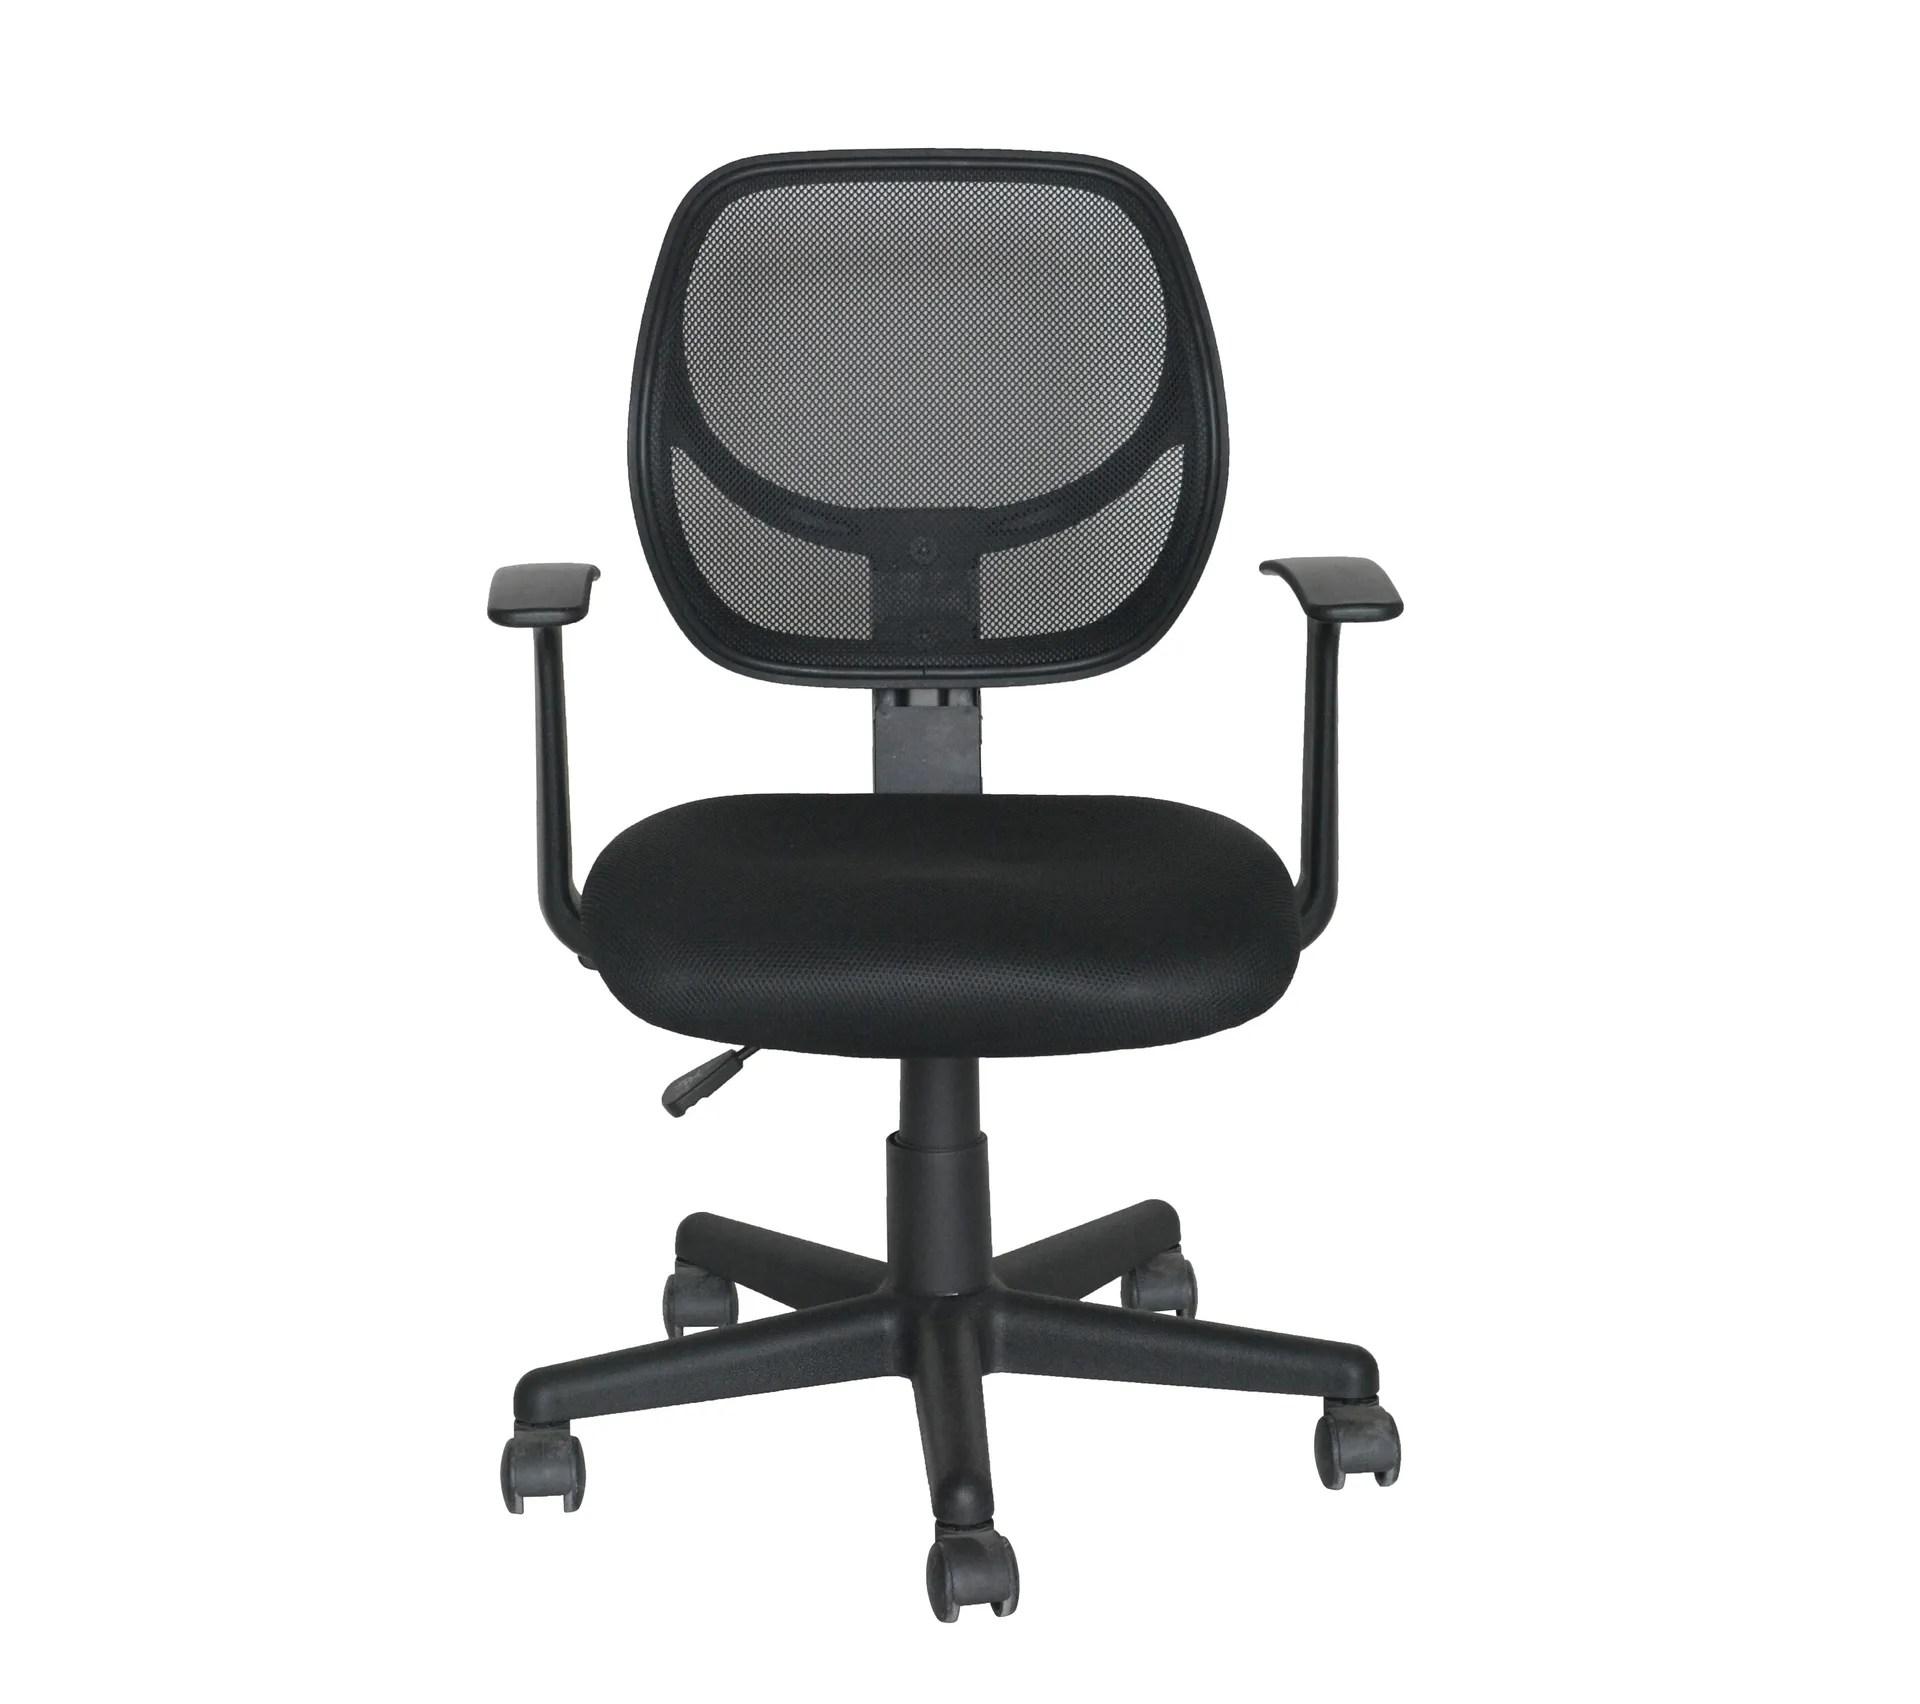 chaise dactylo wizz 2 noir